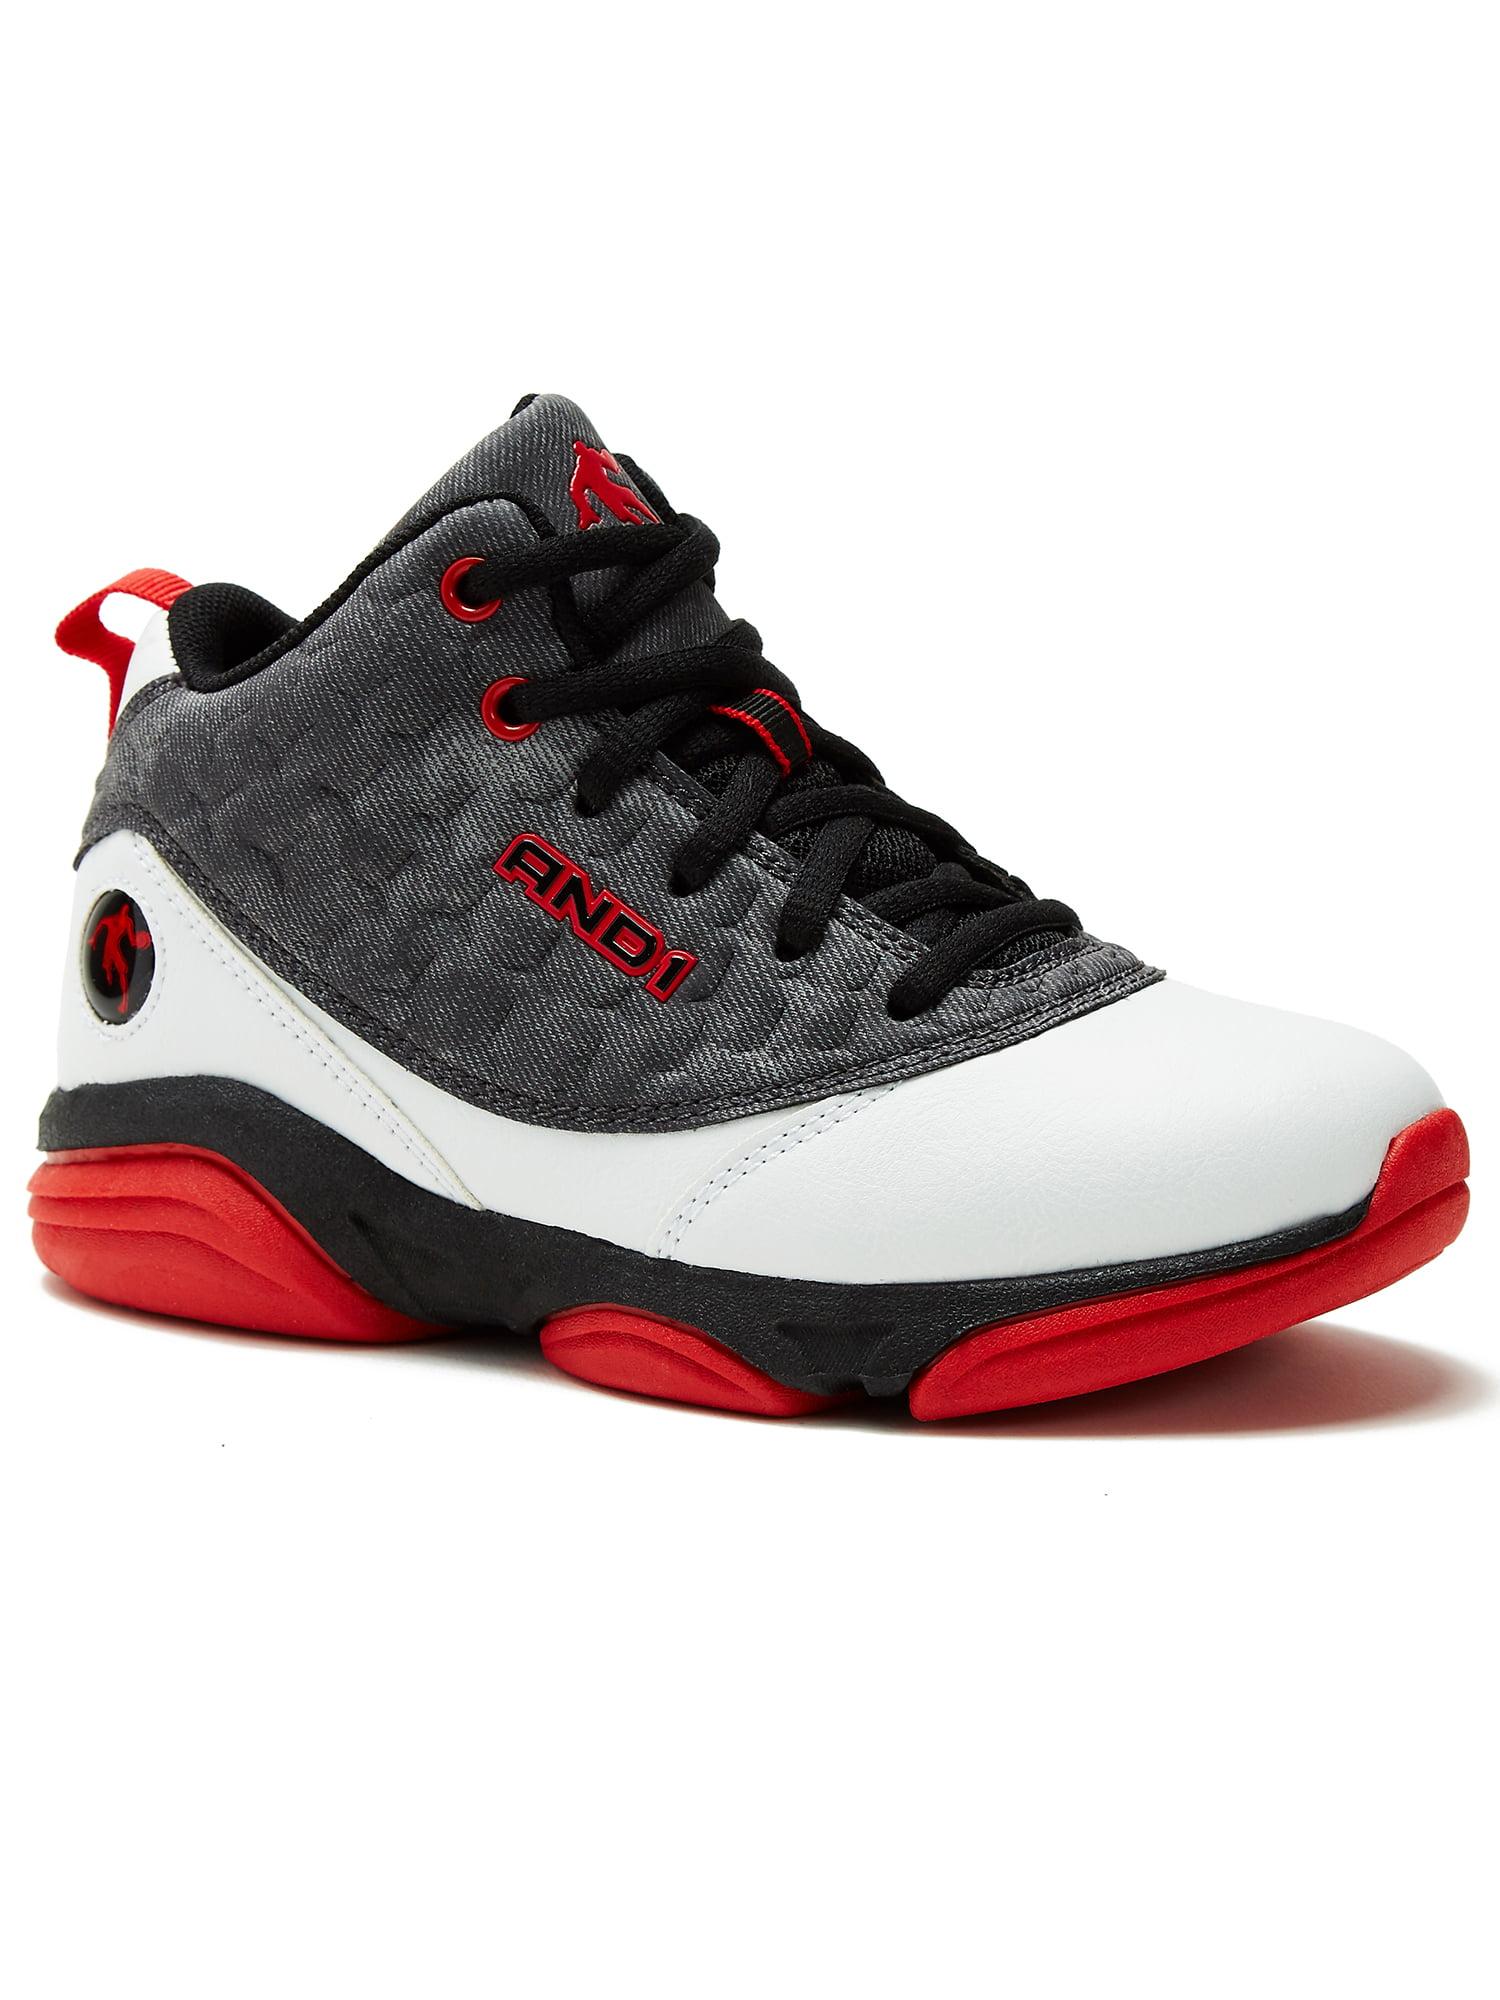 Boys' And1 Bankster Athletic Shoe - Walmart.com